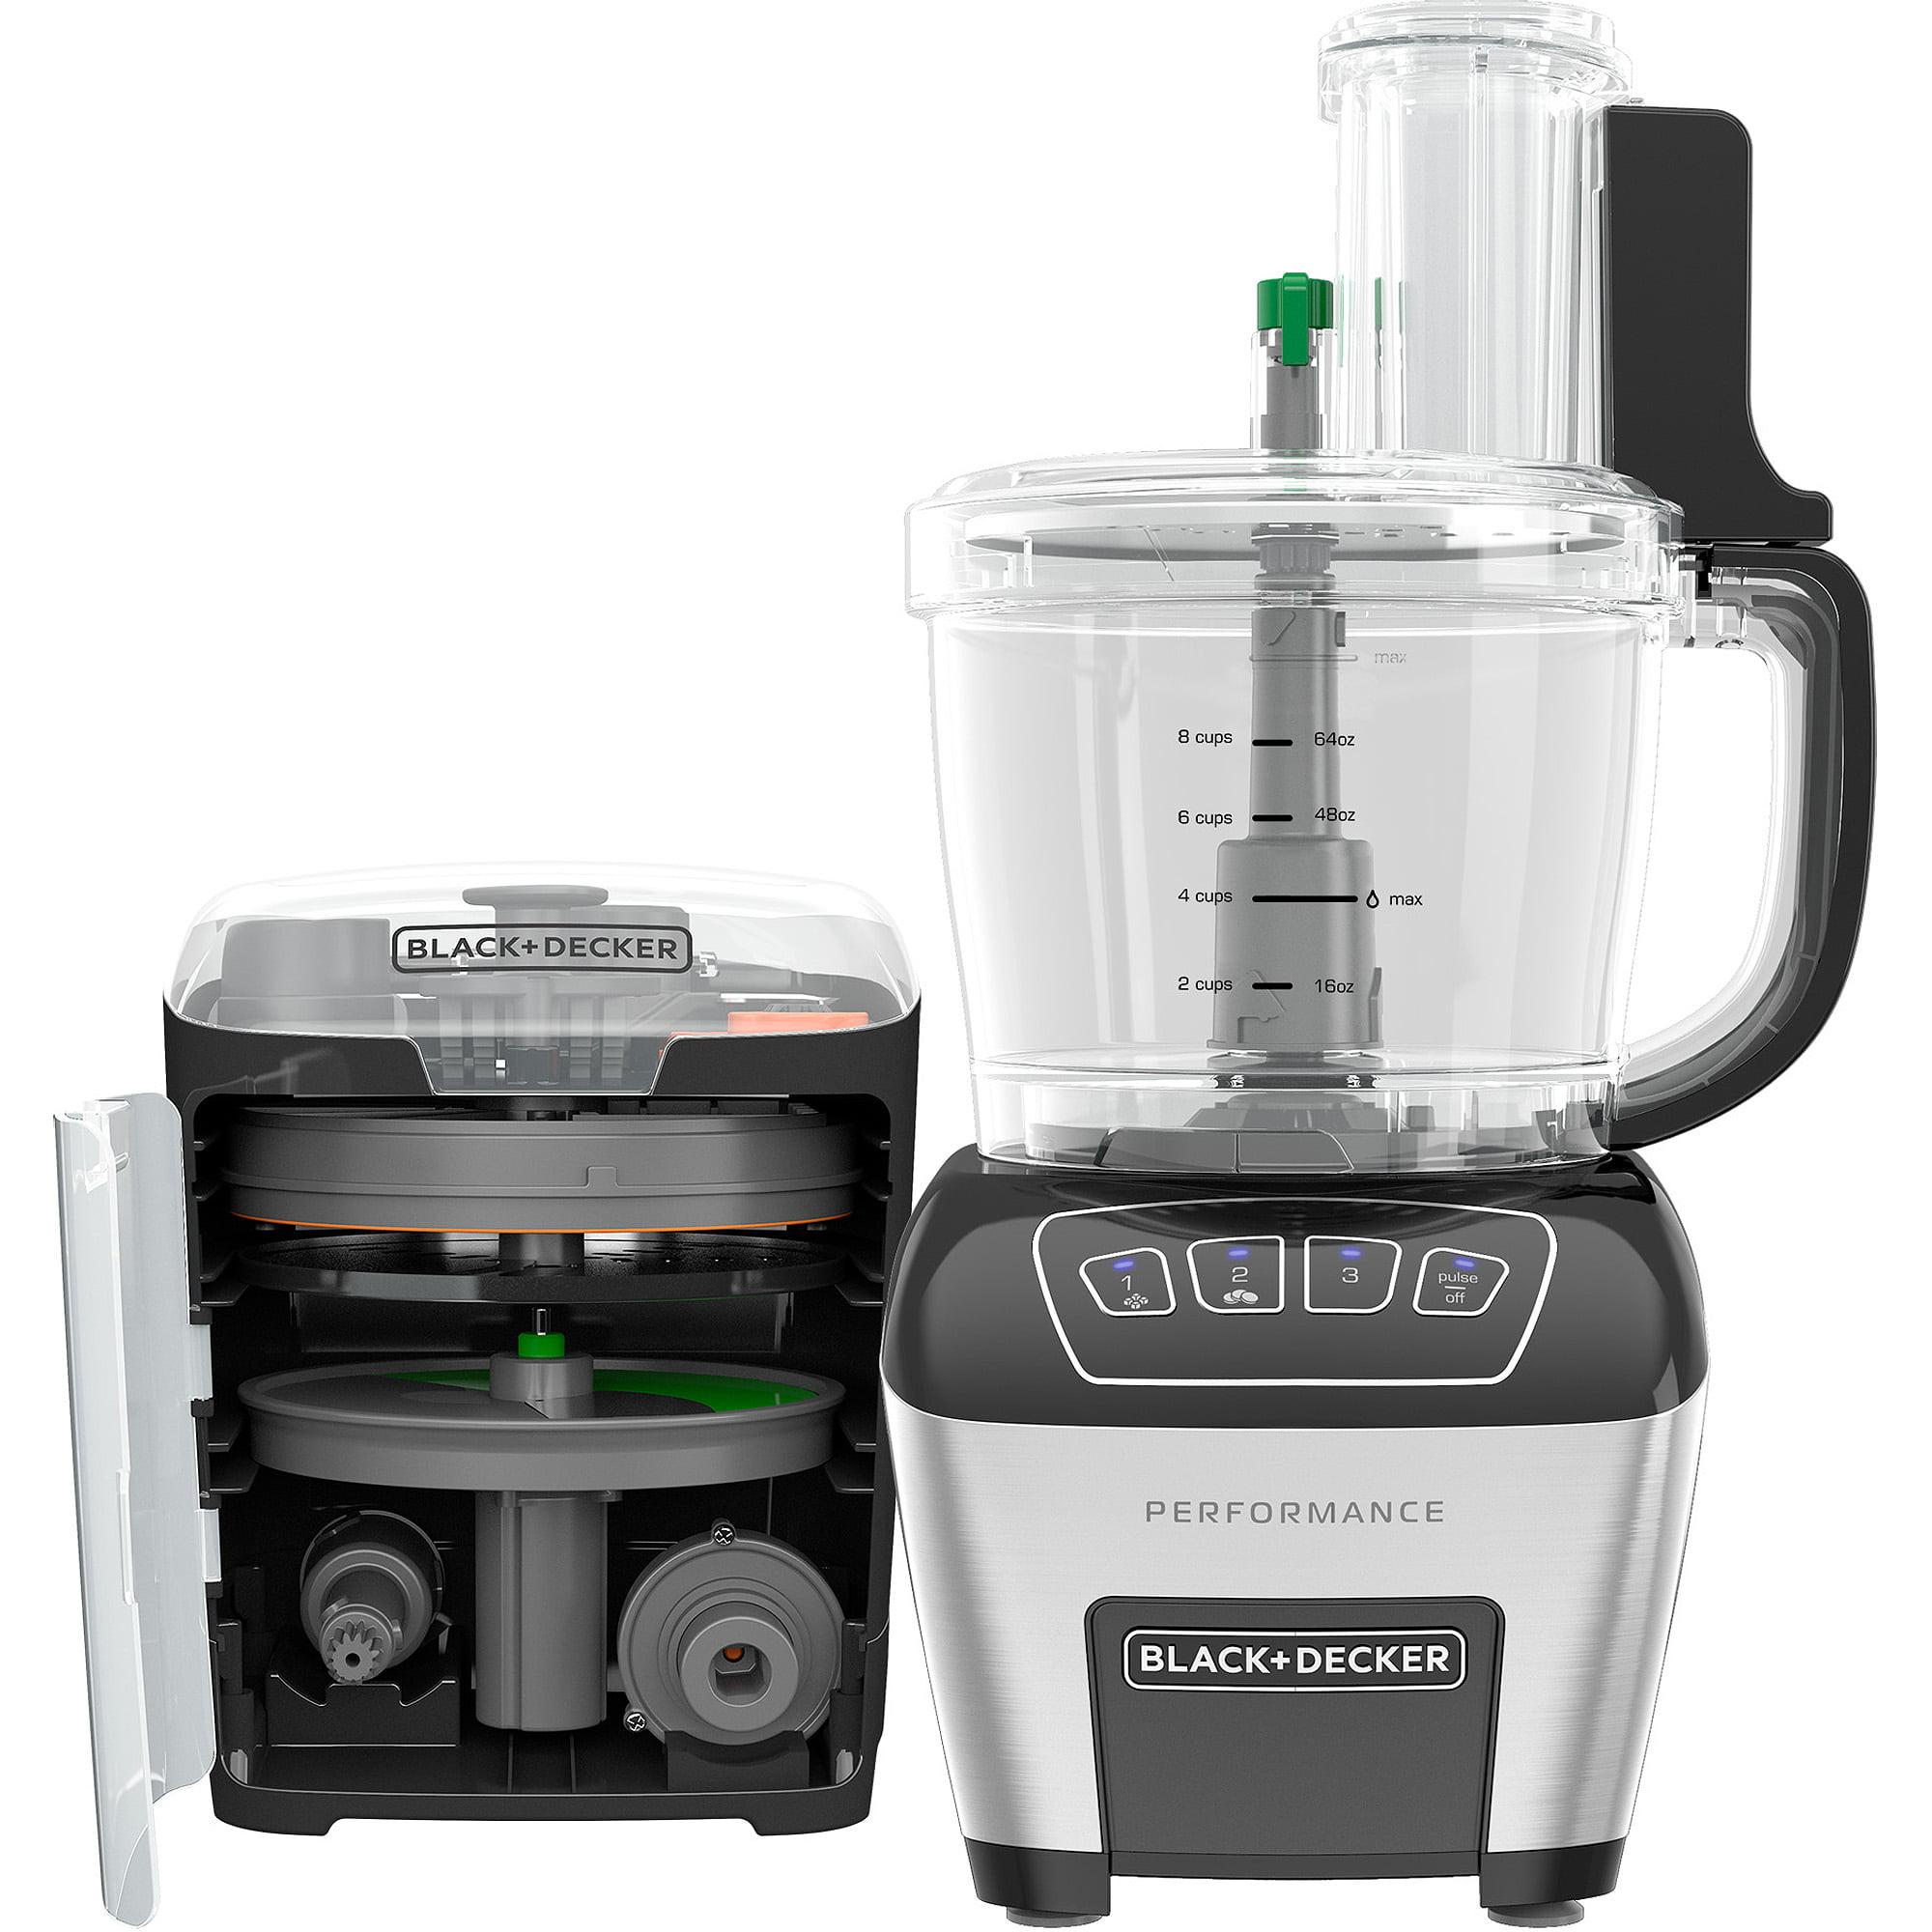 Uncategorized Black & Decker Kitchen Appliances blackdecker 11 cup dicing and slicing performance food processor fp6010 walmart com